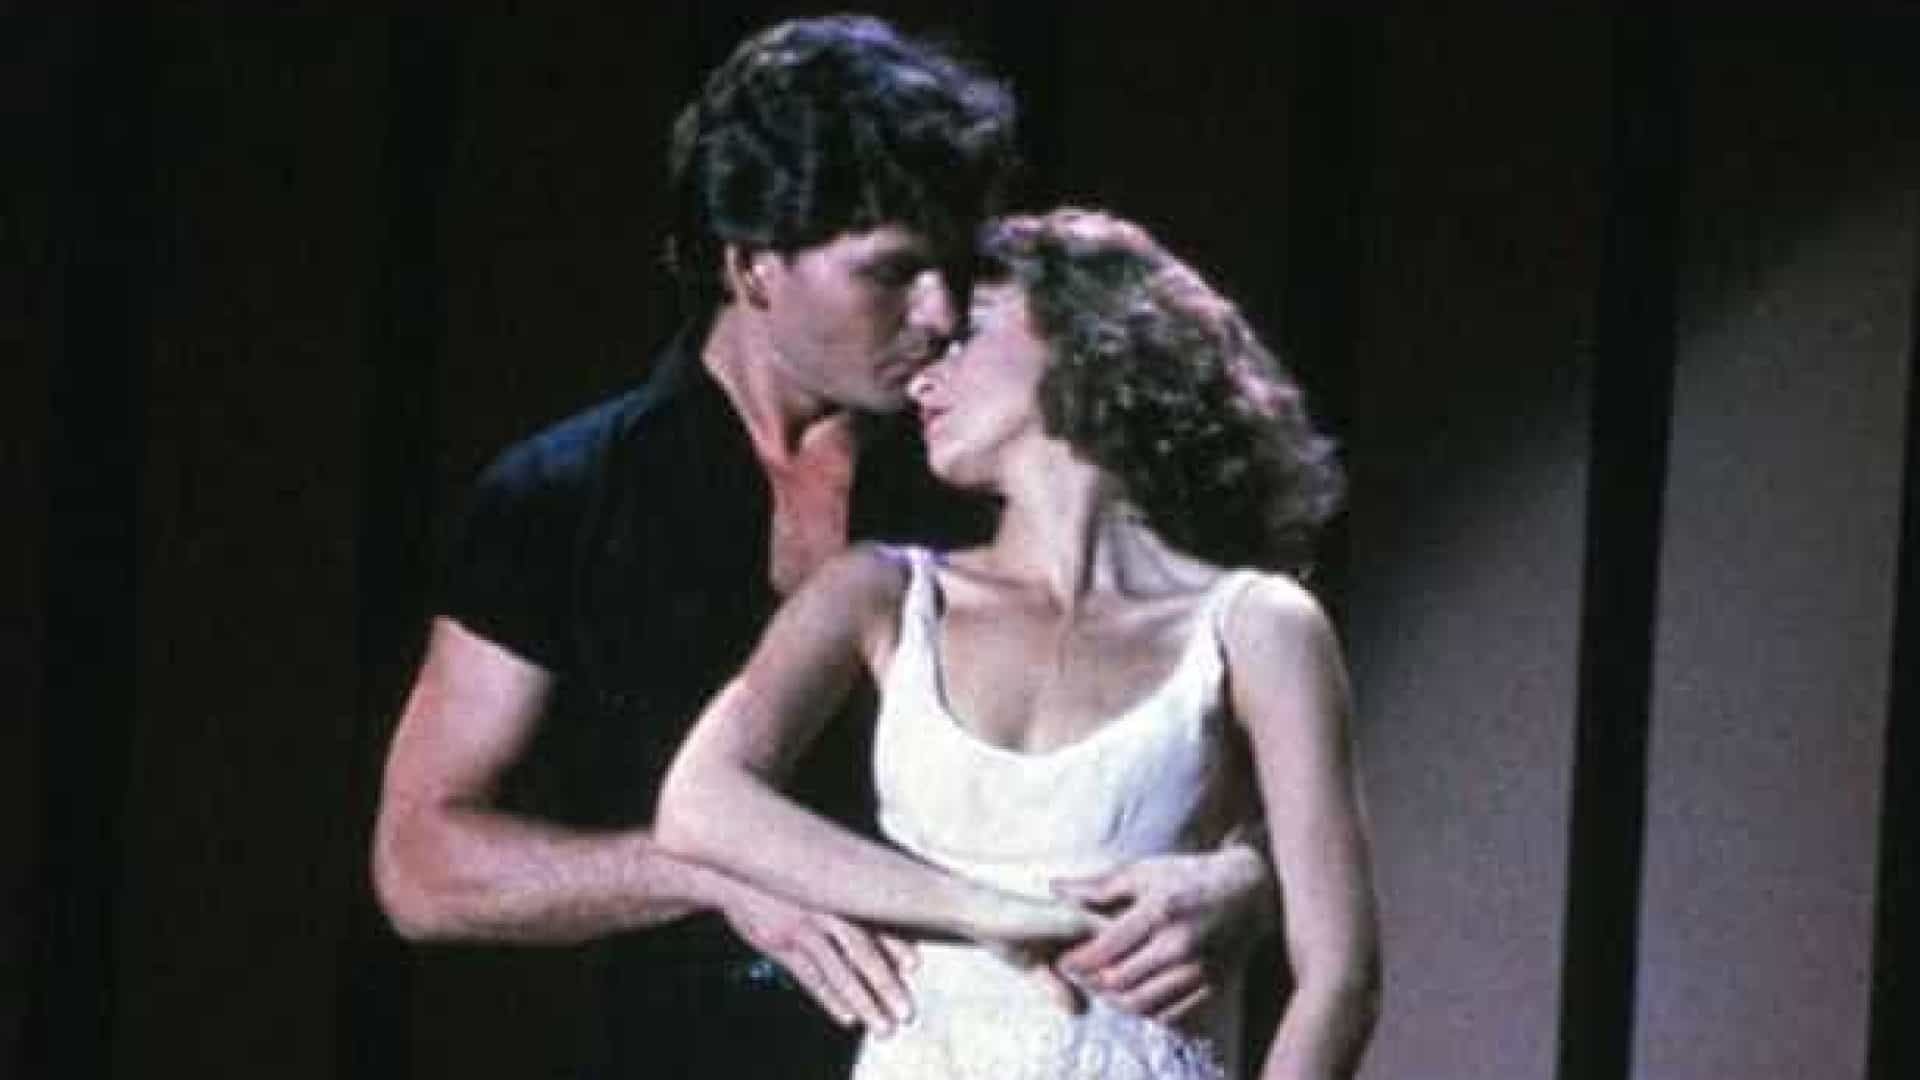 Alerta fãs! 'Dirty Dancing' está de volta e com Jennifer Grey